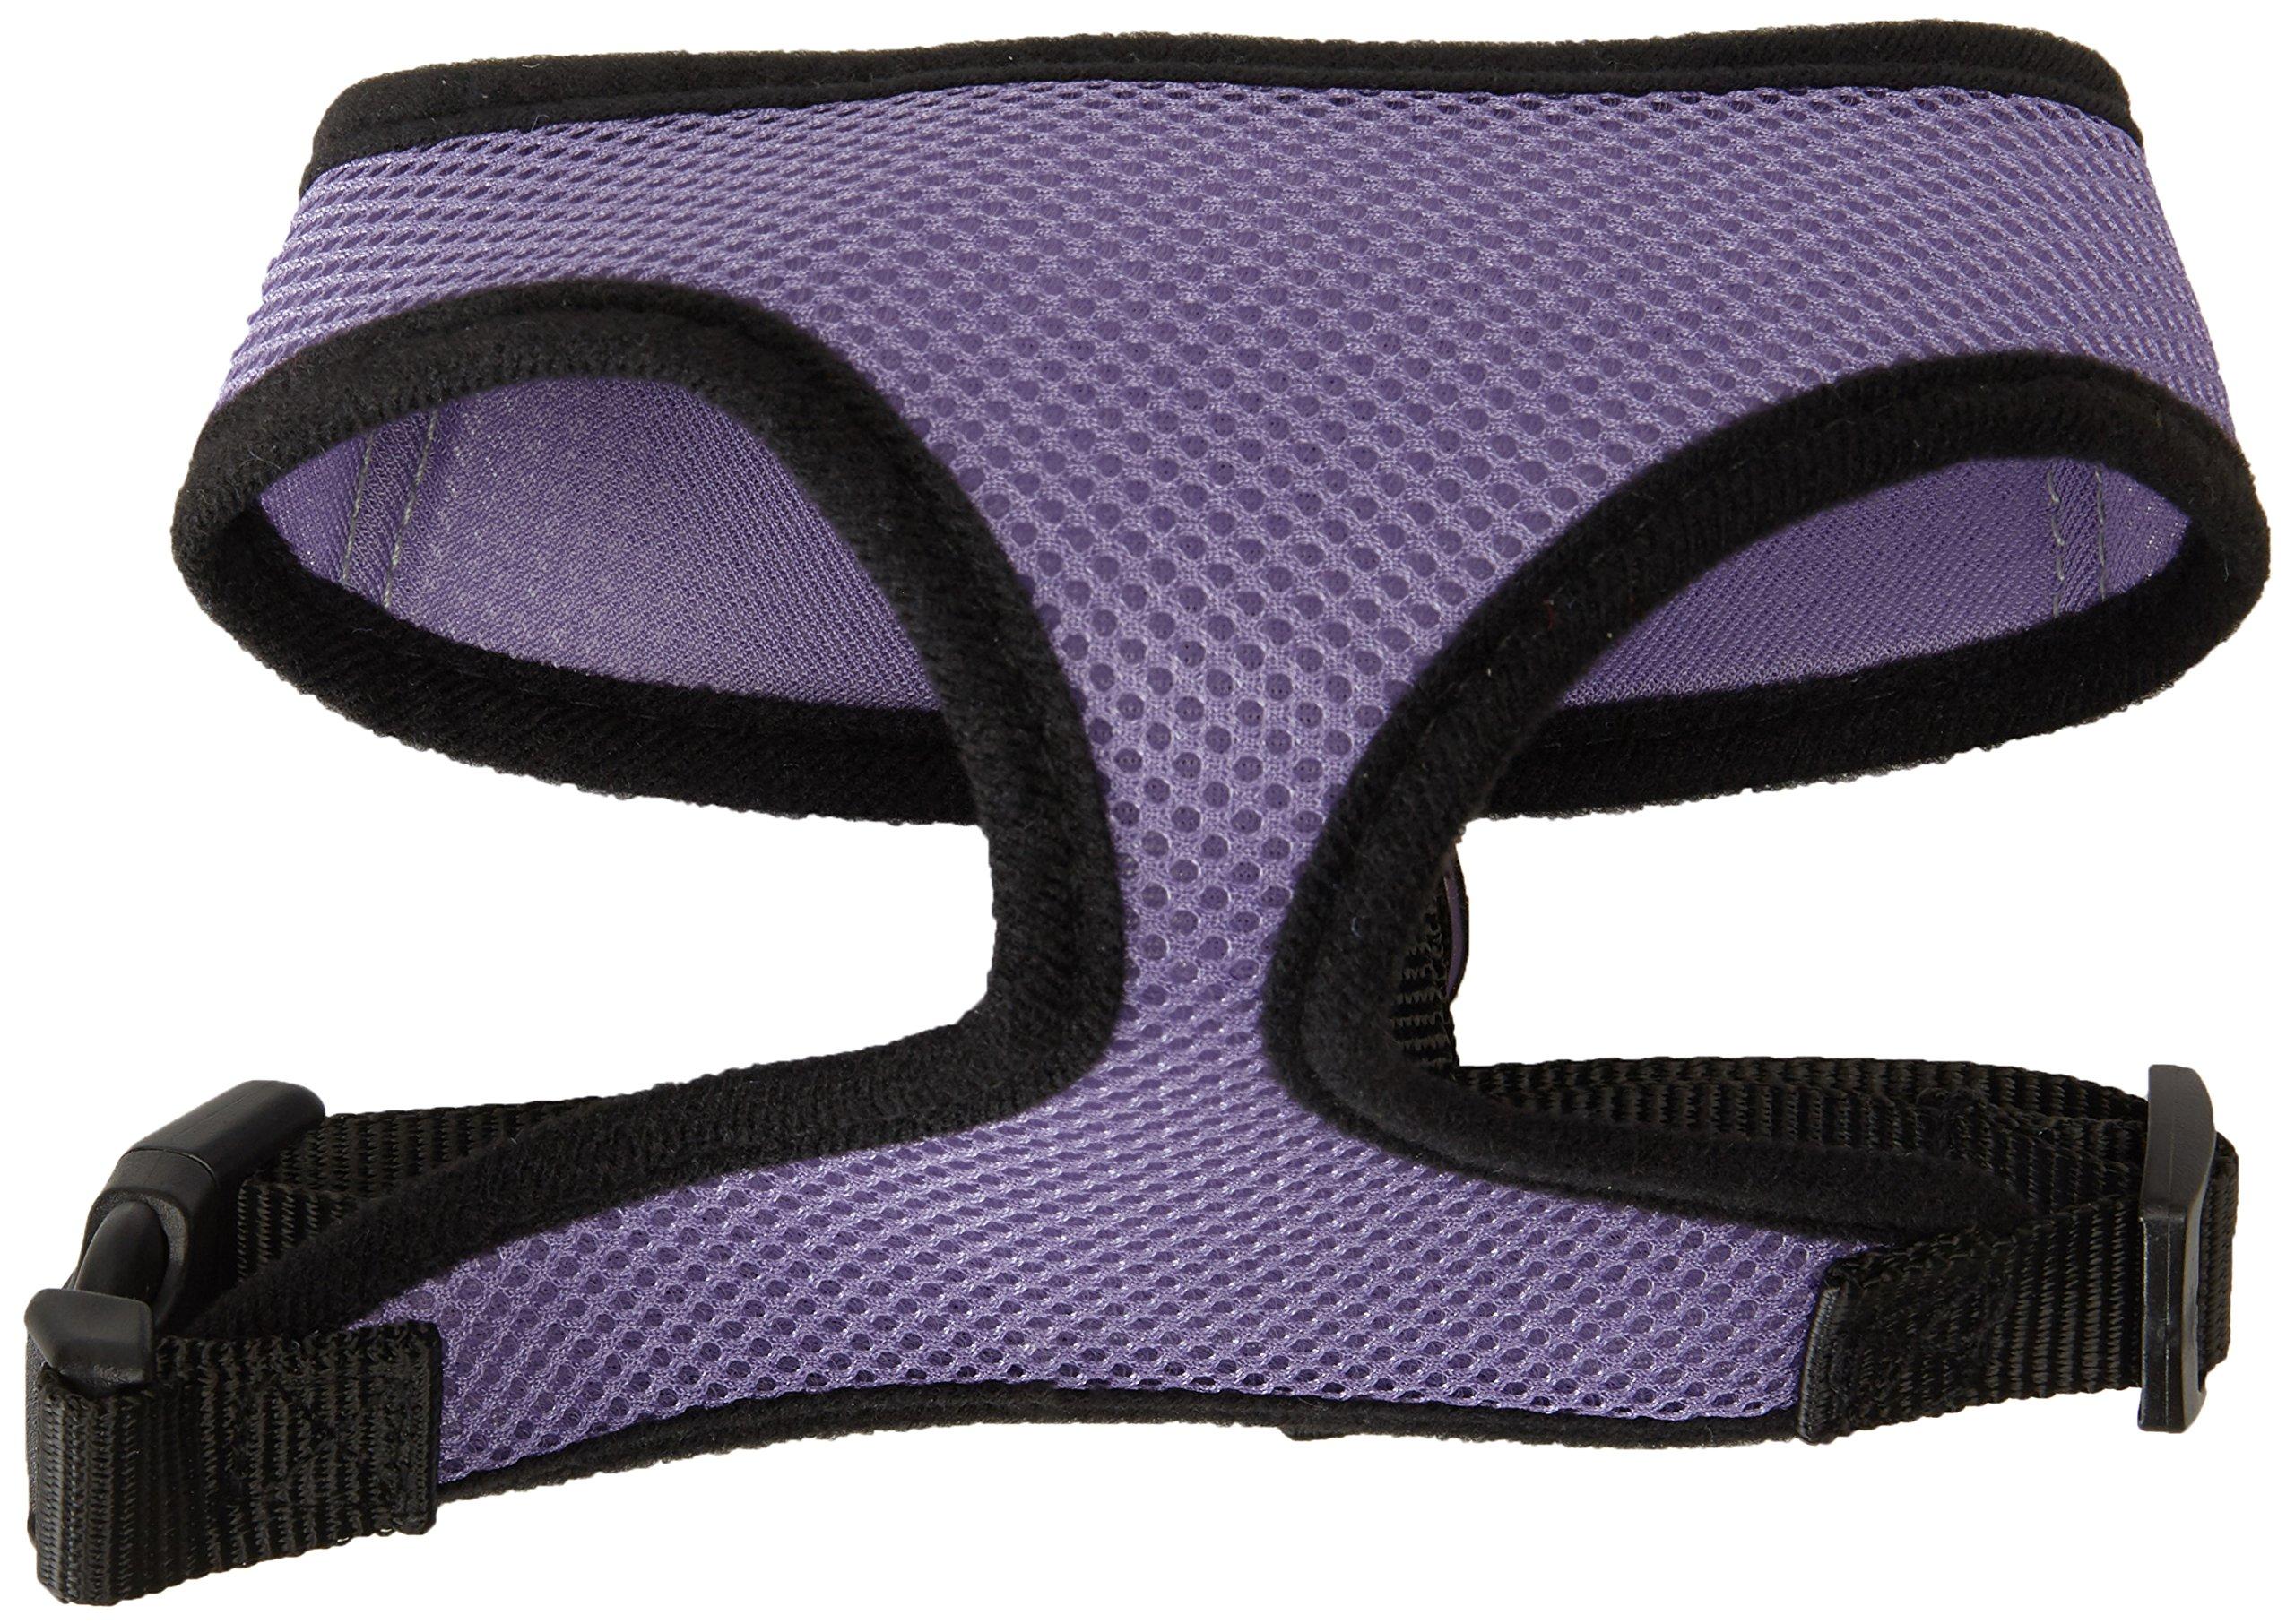 OxGord Pet Control Harness for Dog & Cat Easy Soft Walking Collar, Medium, Purple